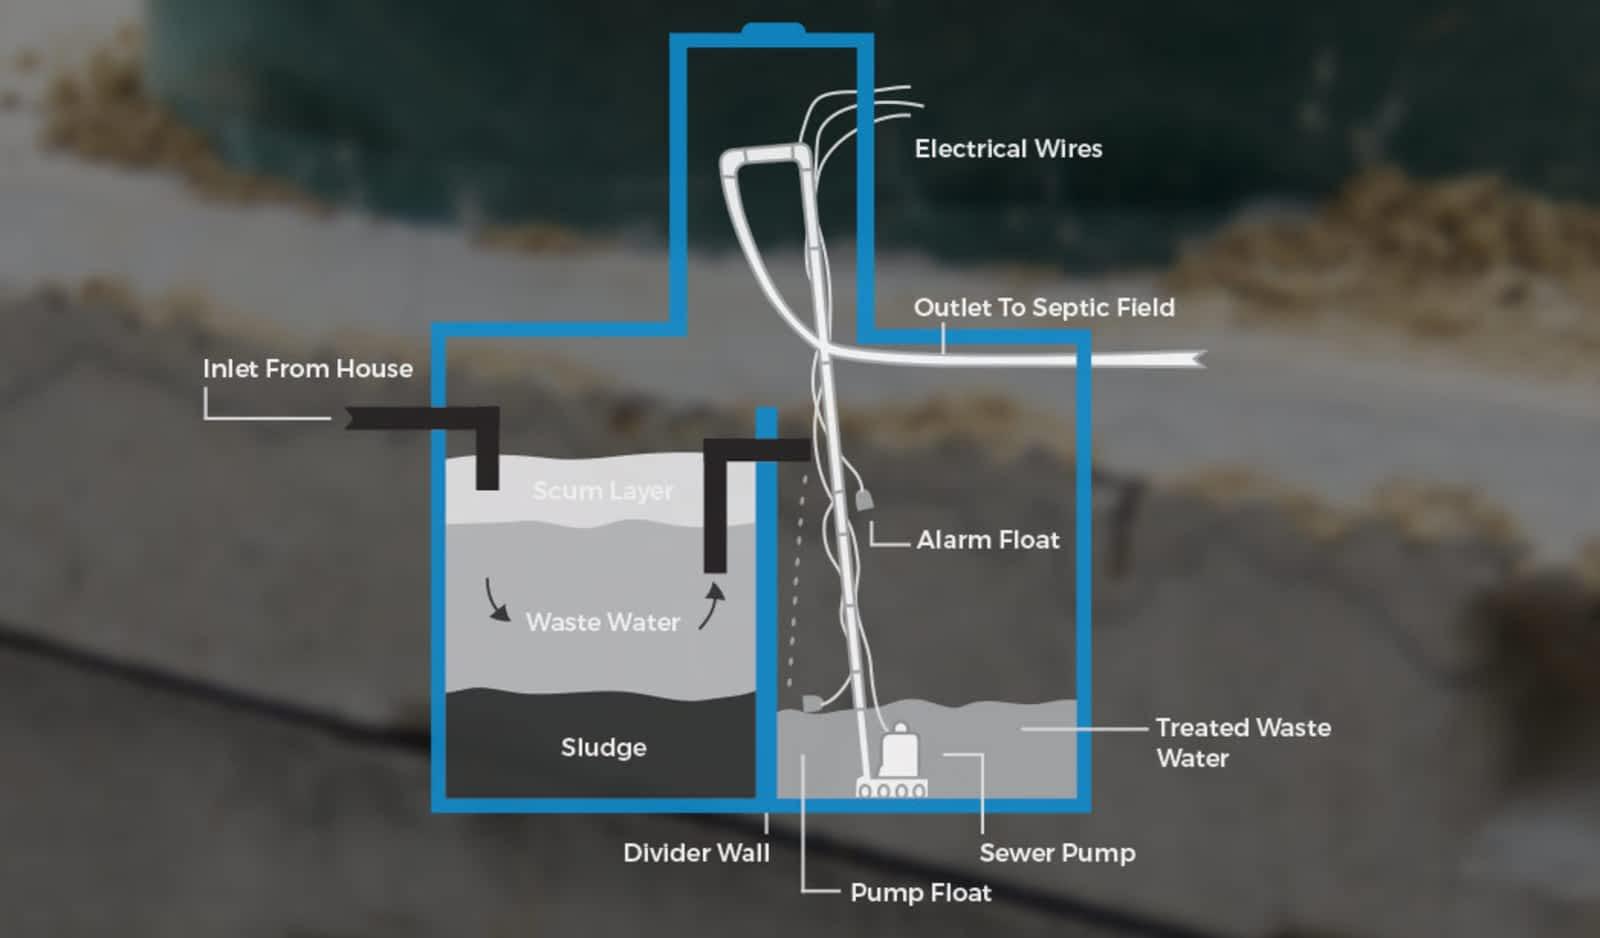 Dagwoods Vac Service Opening Hours Stony Plain Ab Septic Pump Alarm Wiring